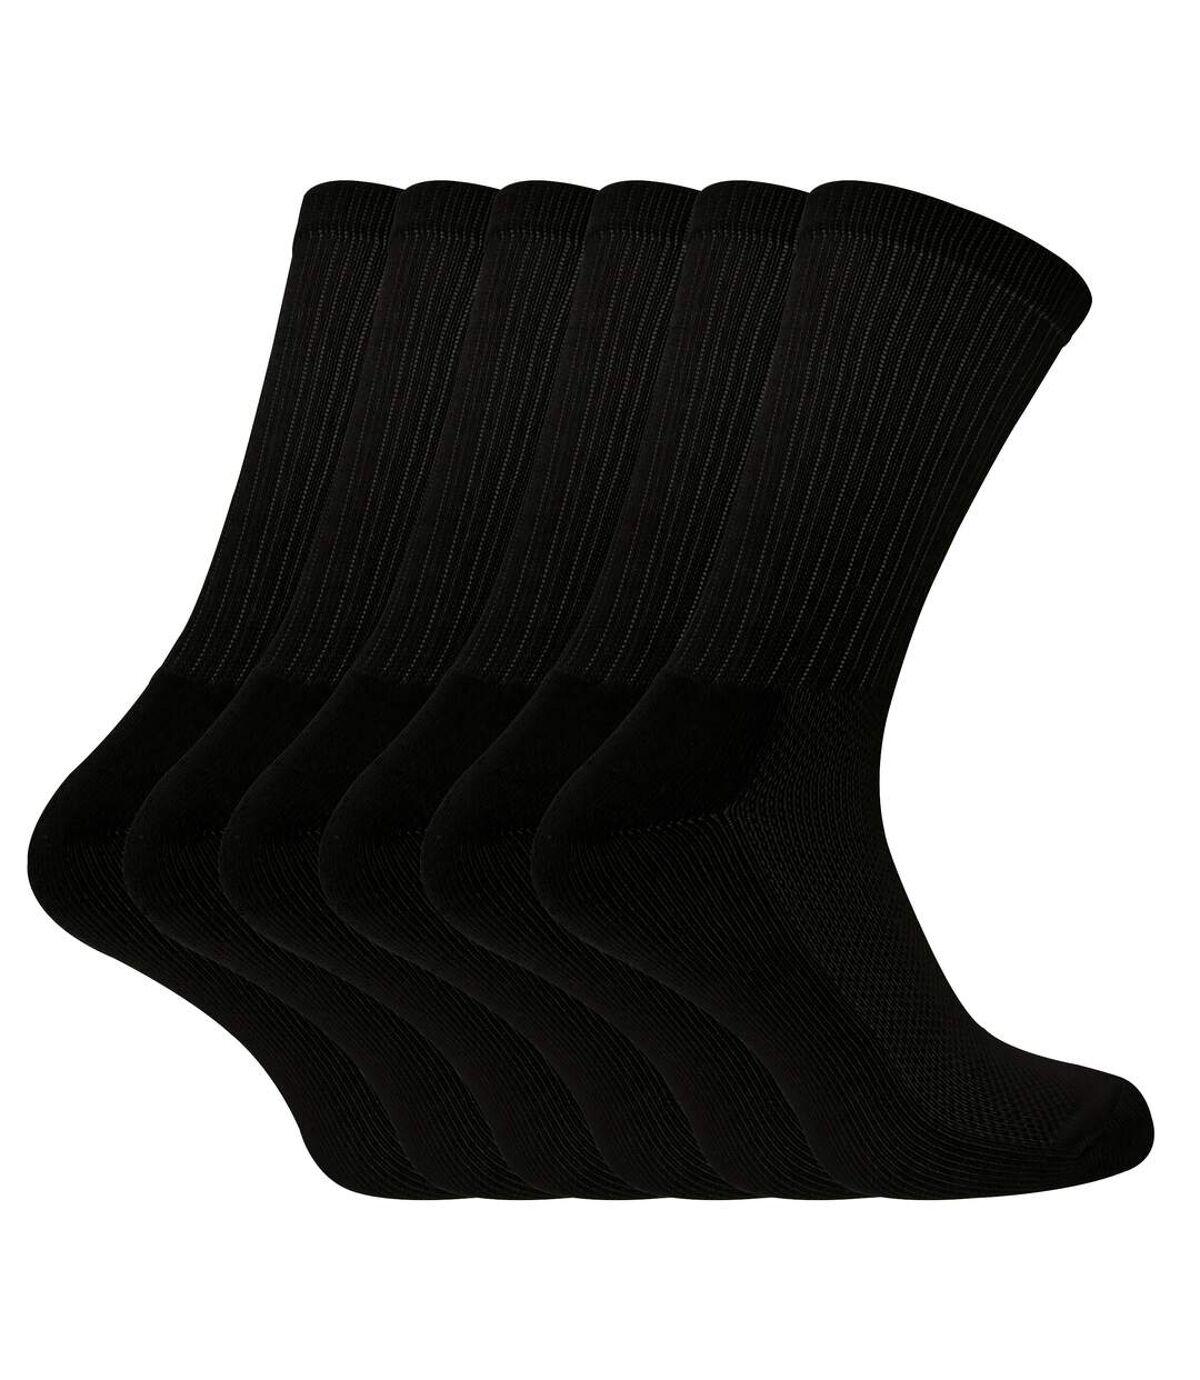 6 Pk Mens Bamboo Organic Cotton Sports Socks